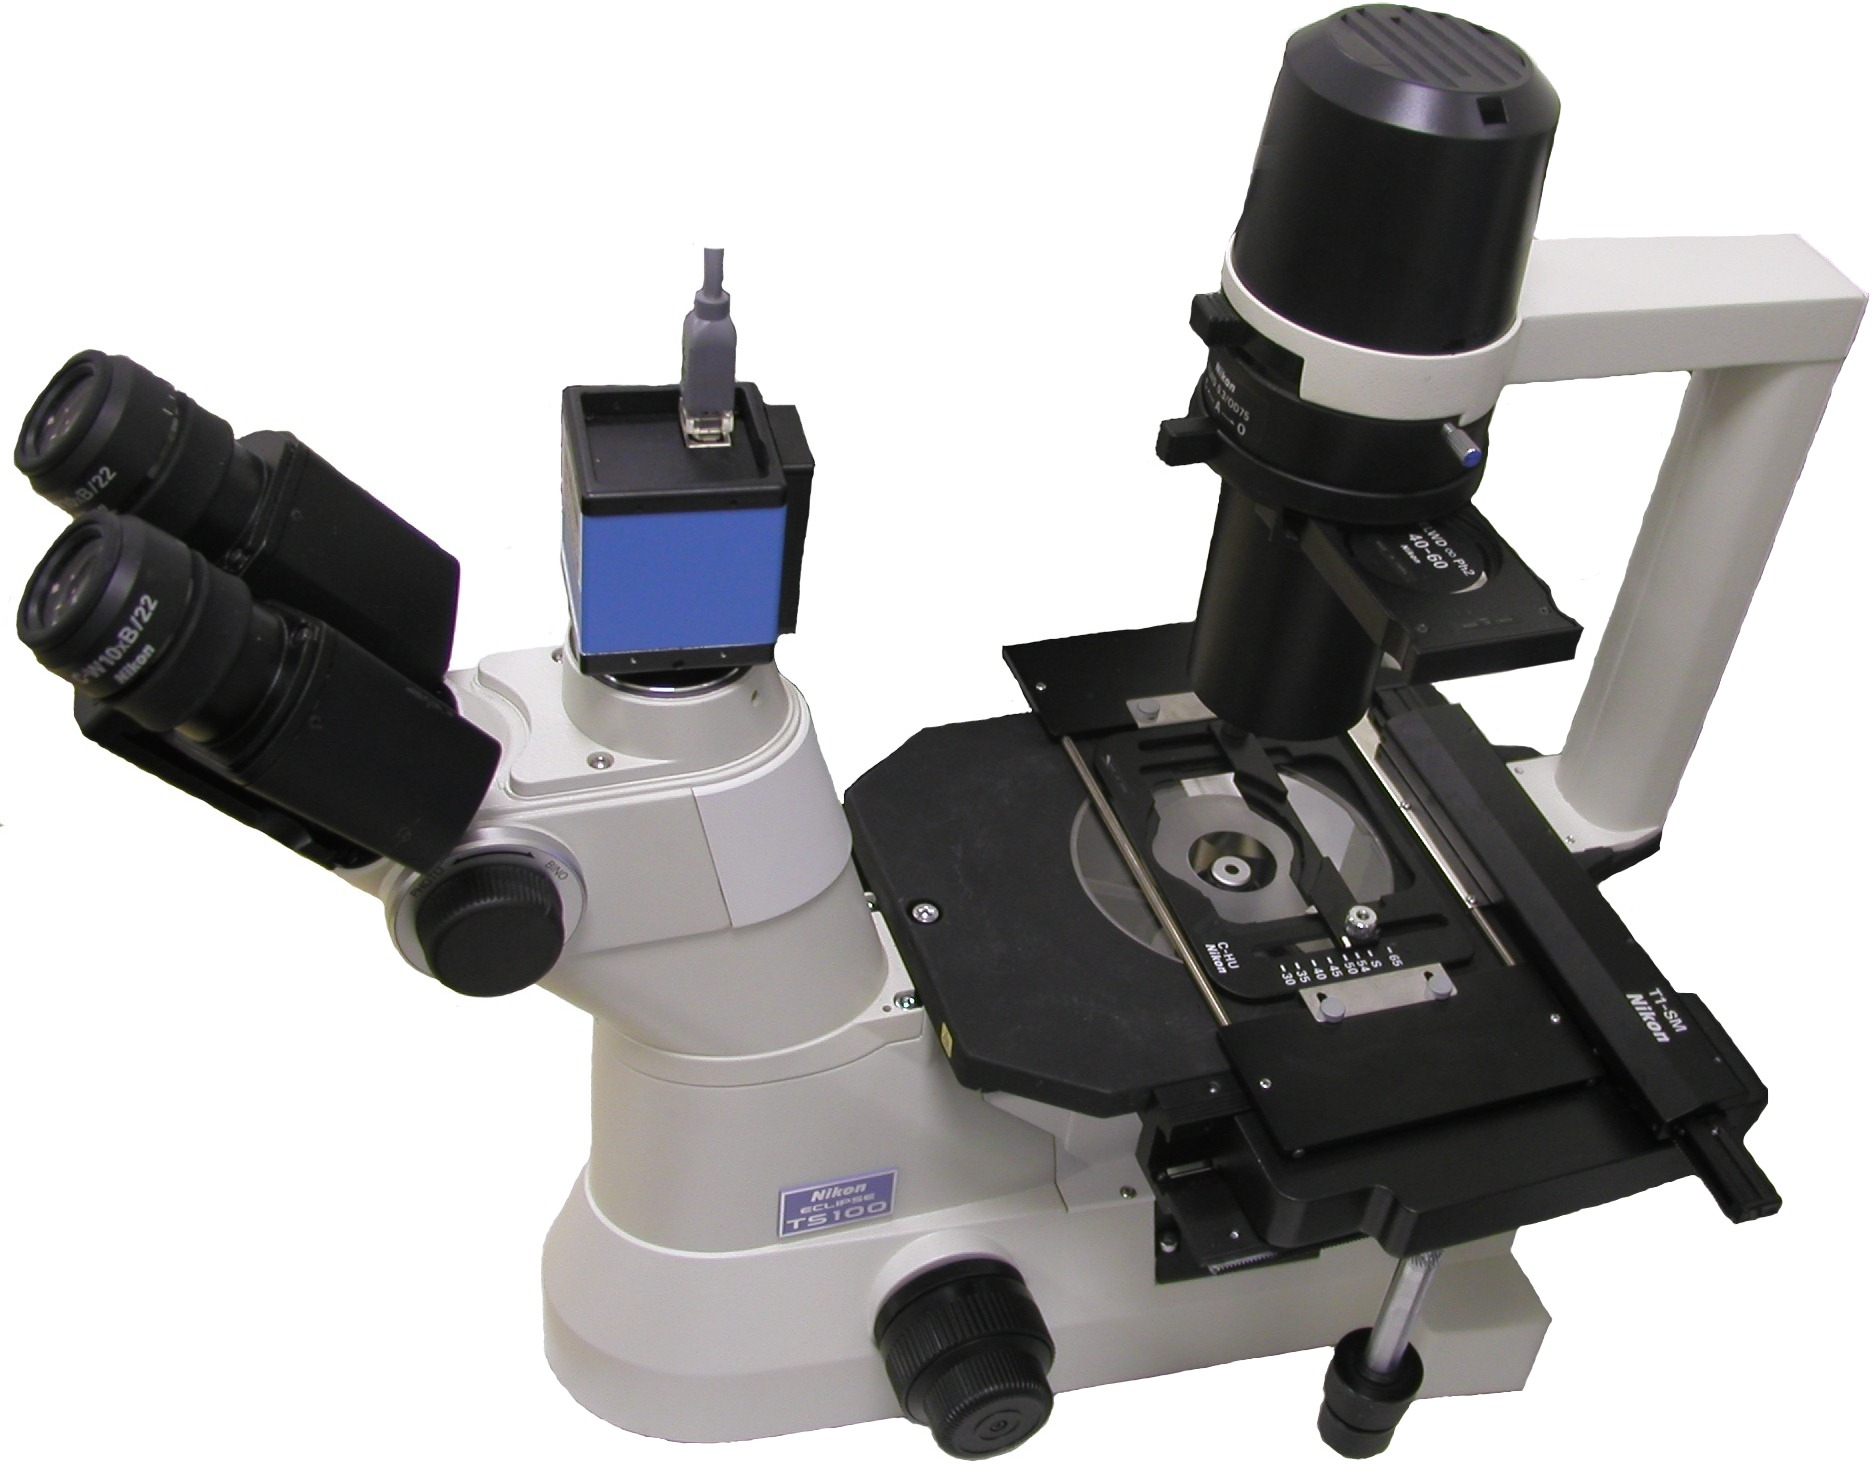 nikon eclipse ts100 f led ceitec cz rh biophotonics ceitec cz Inverted Microscope with Camera Nikon Microscope